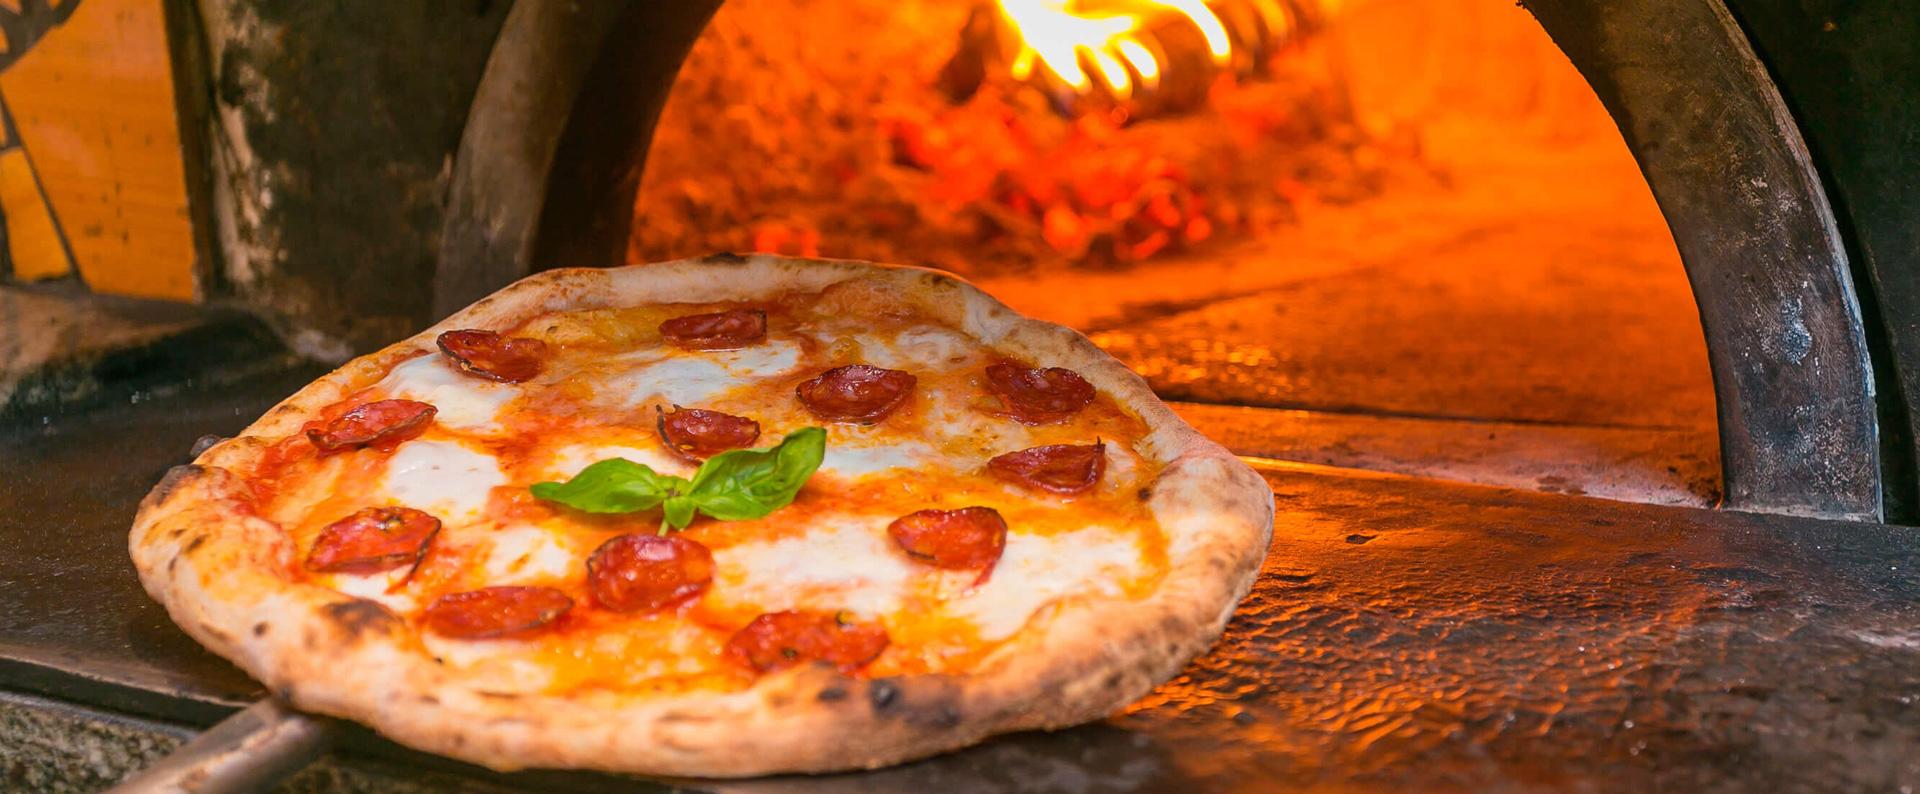 pizzeria-marina-di-grosseto-forno a legna four-roses